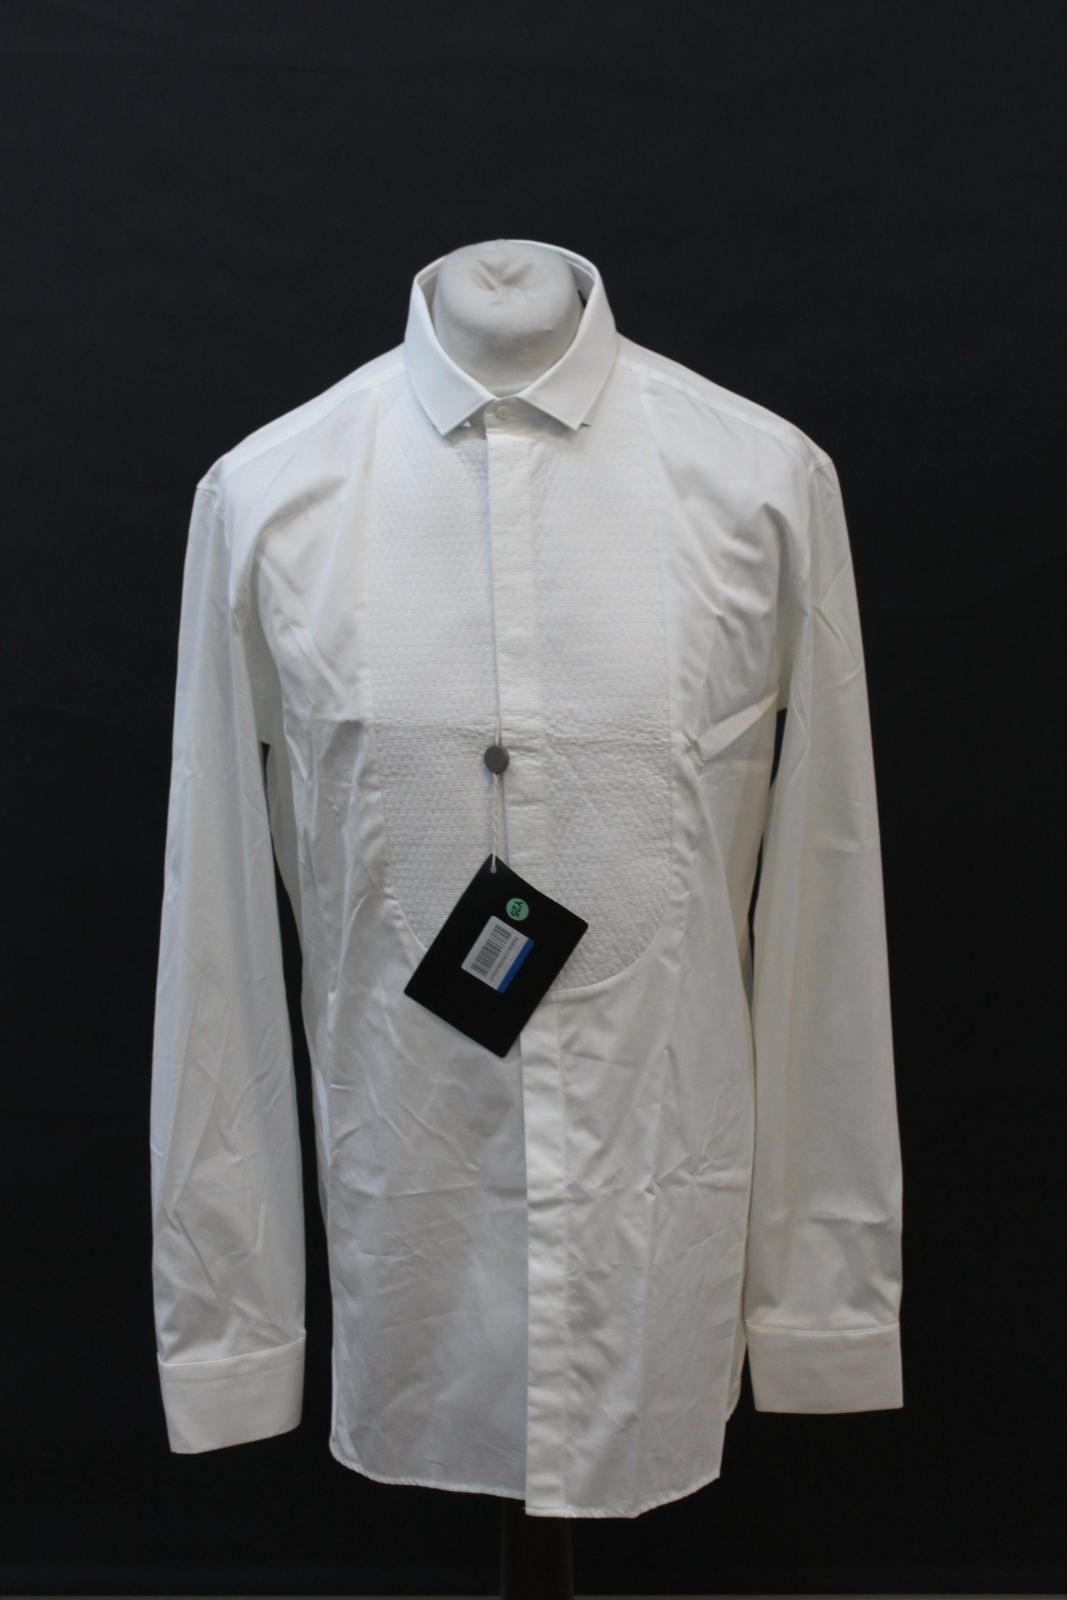 Neil-Barrett-Hombre-Blanco-De-Algodon-Manga-Larga-Camiseta-Formal-Cuello-17-034-43cm-BNWT